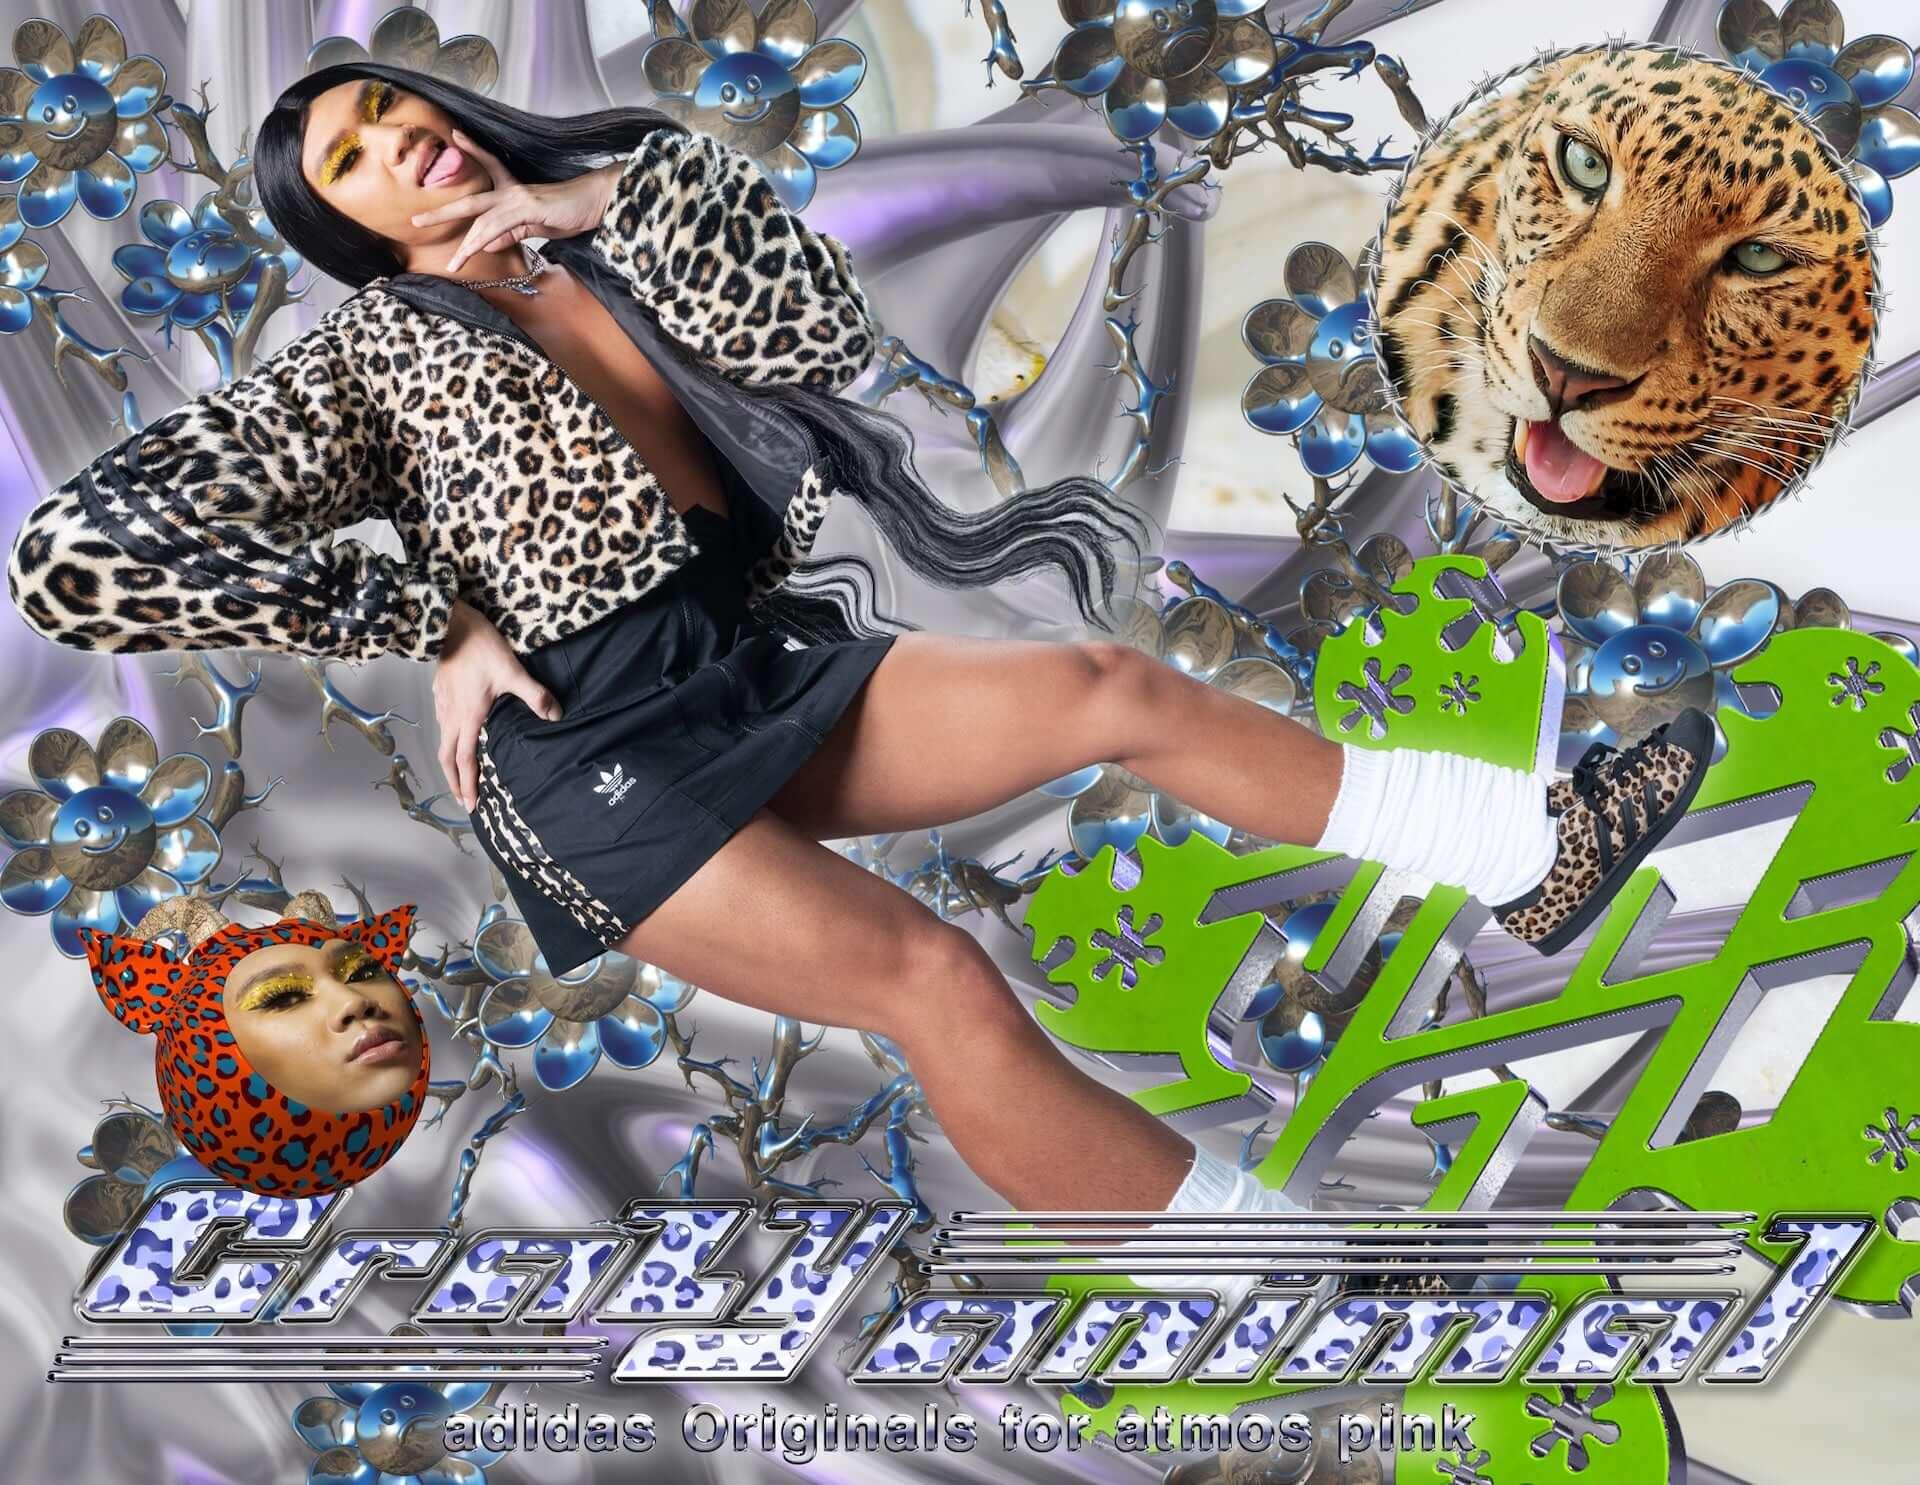 <YAGI>がビジュアルプロデュースしたadidas Originals「CRAZY ANIMAL」がatmos pinkに登場!オカモトレイジら出演のローンチイベントも開催 lf201014_adidas-crazyanimal_4-1920x1485